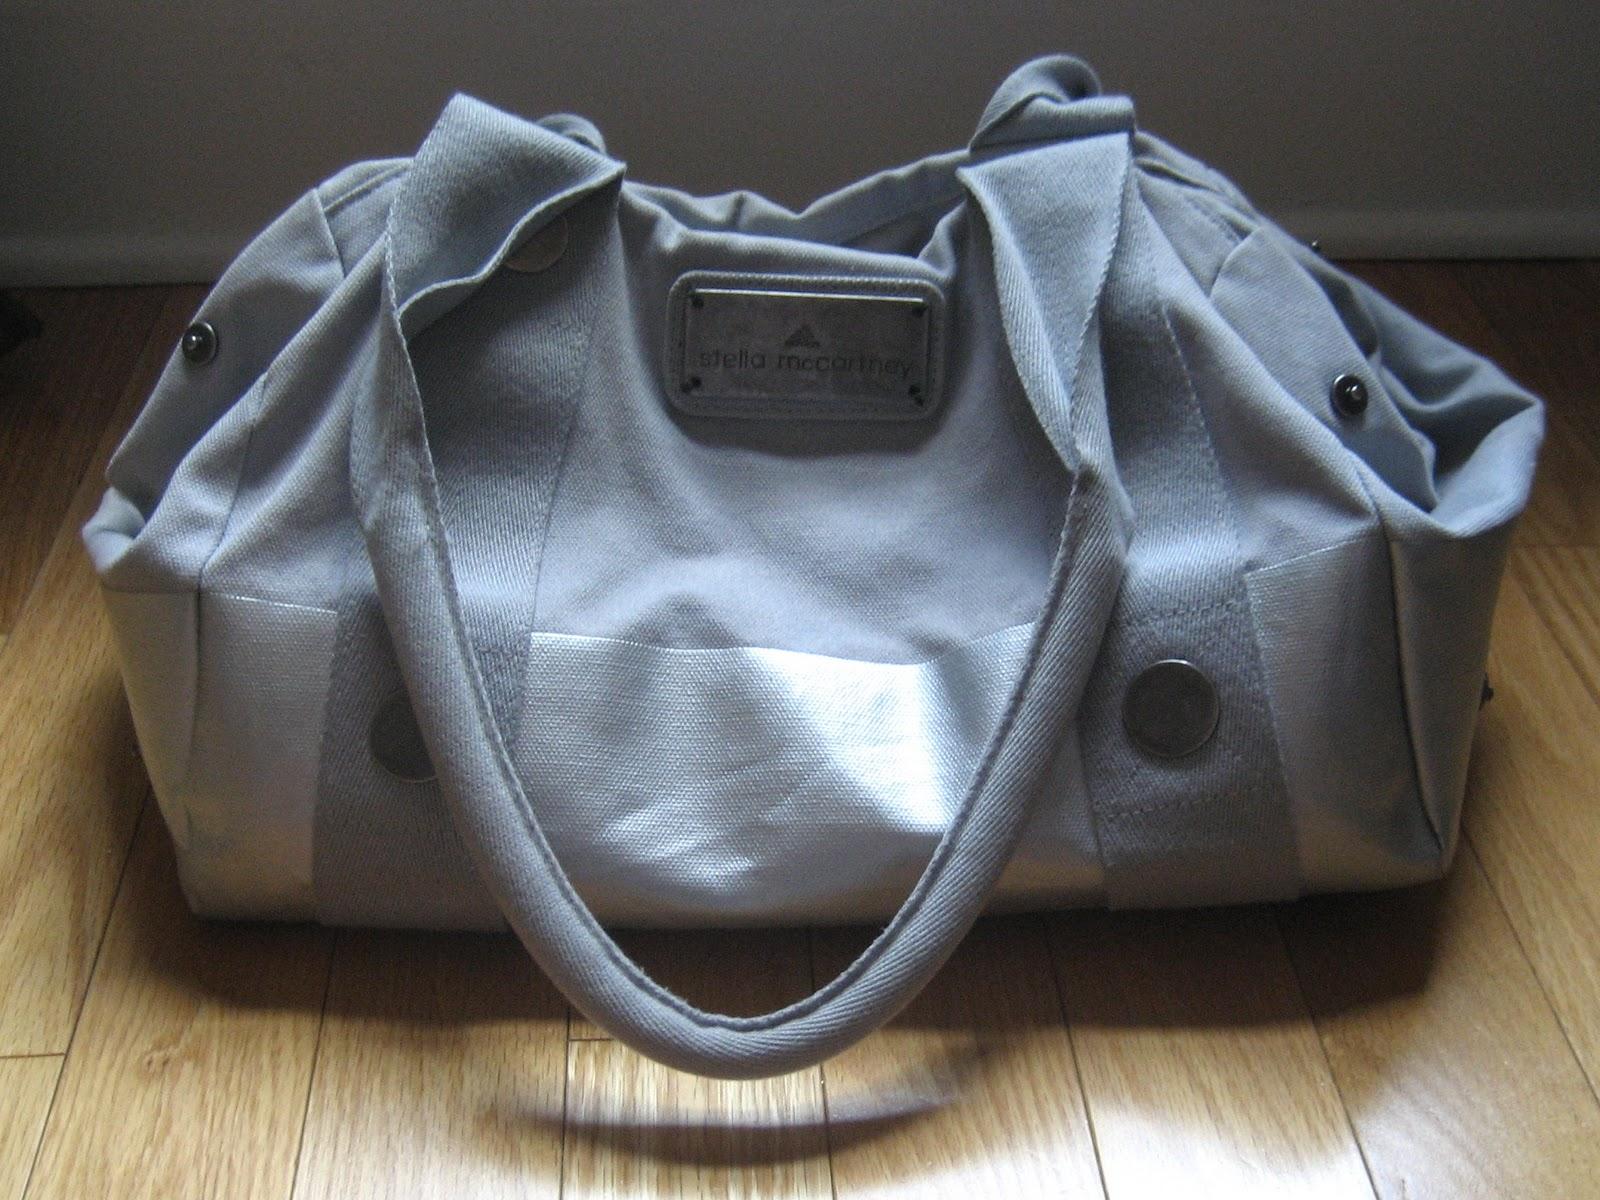 http://4.bp.blogspot.com/-JJ3oS05R7C8/TZPp83s0qpI/AAAAAAAAAVk/f3nhIdf1WKQ/s1600/purse.jpg